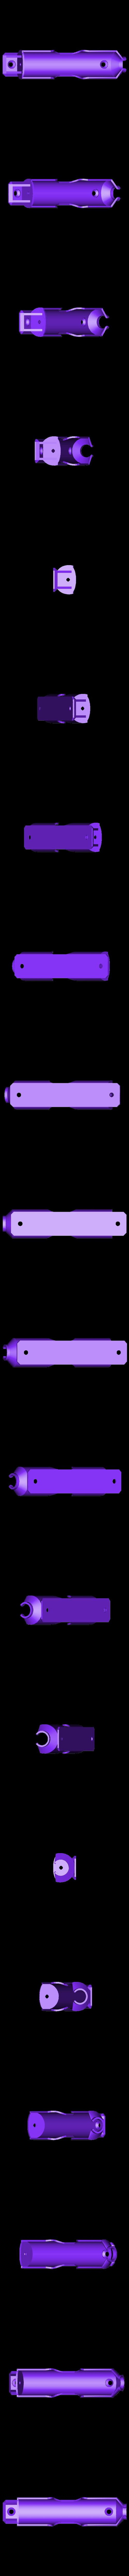 18650_holder-Battery_Holder_Frame.stl Télécharger fichier STL gratuit Support de pile au lithium 18650 • Design imprimable en 3D, AlbertKhan3D